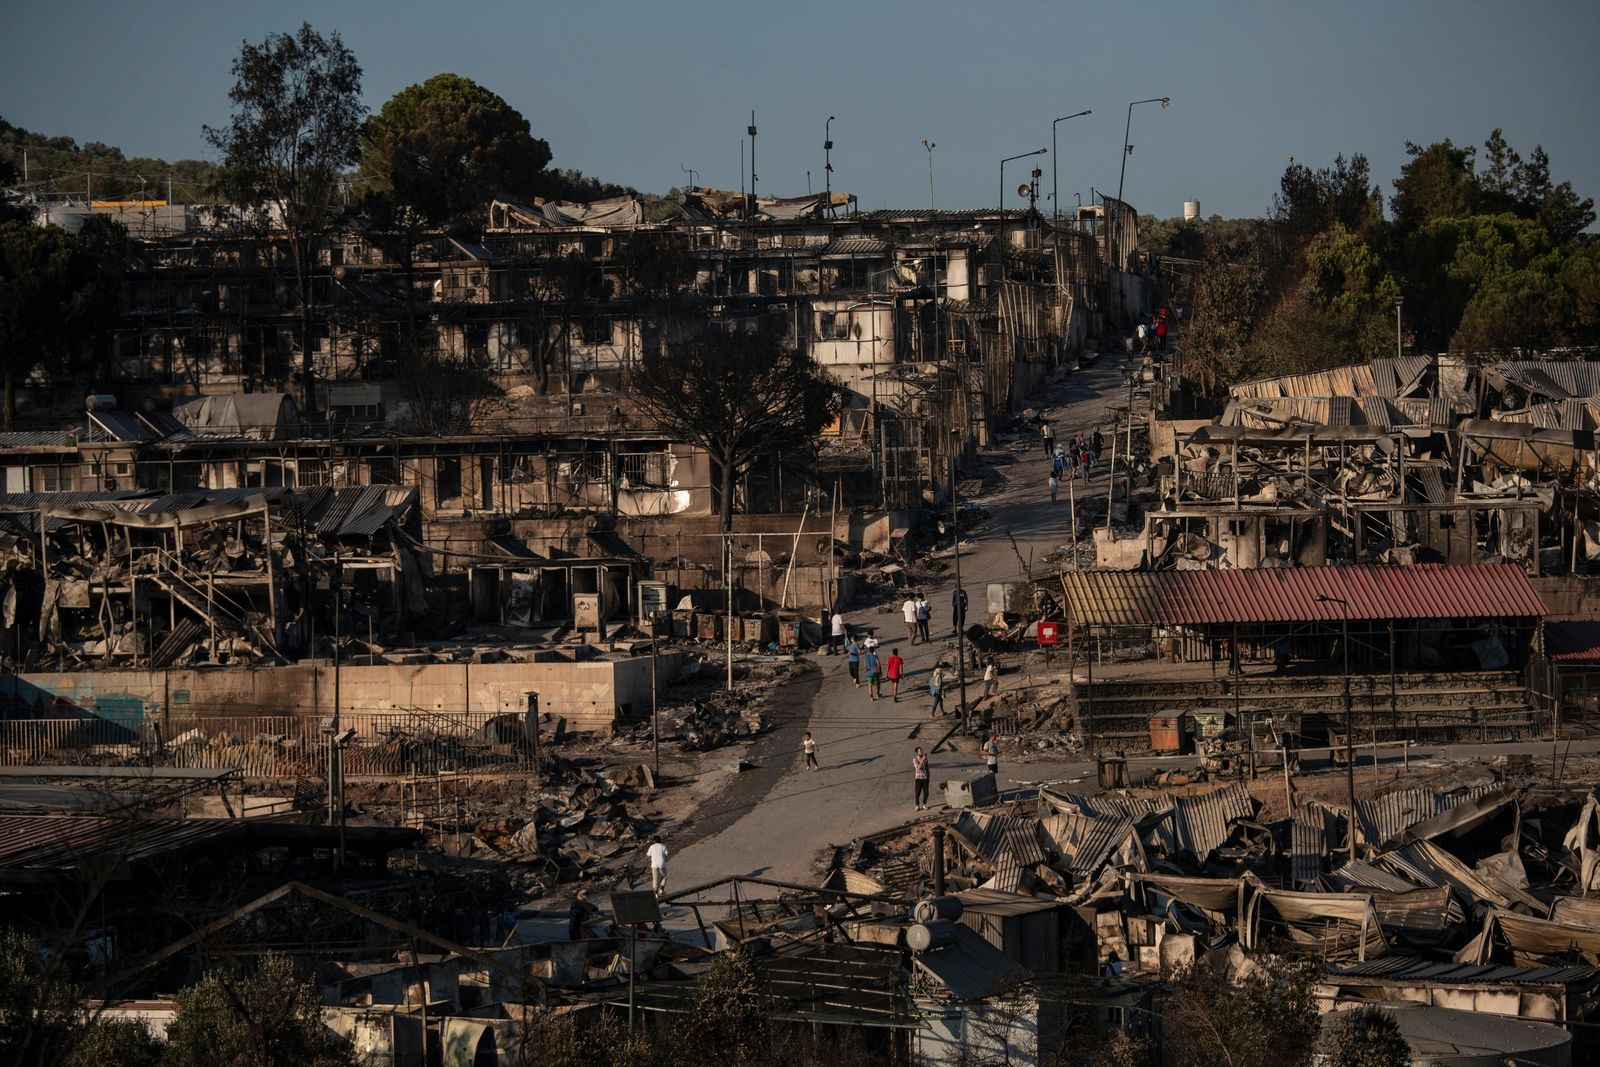 APTOPIX Greece Migrant Camp Blaze